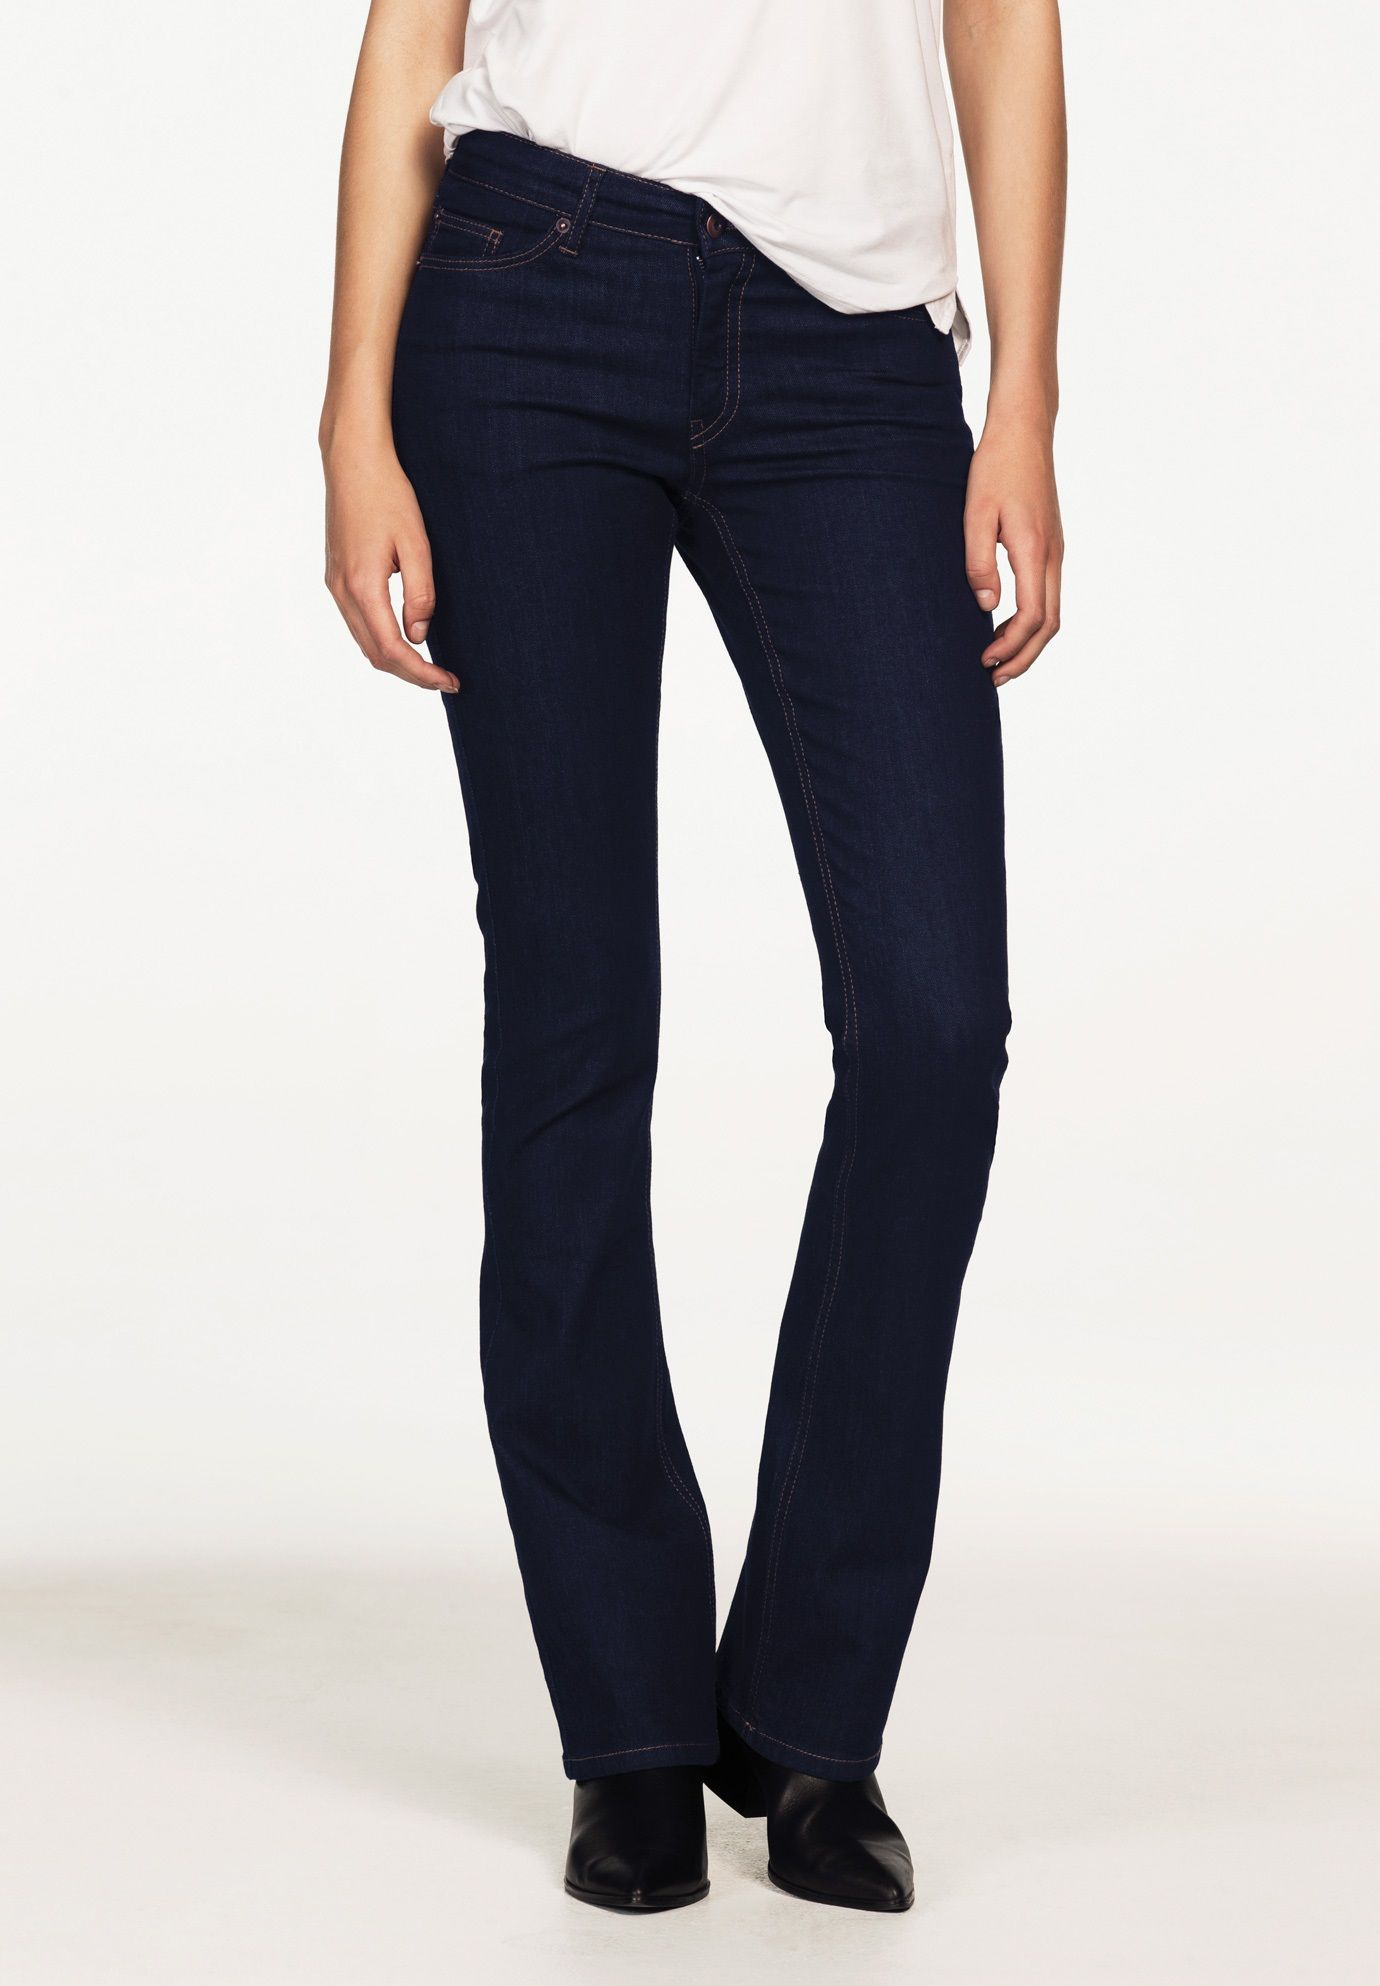 b995b5b65f0 Bootcut Jeans by ellos - Women s Plus Size Clothing